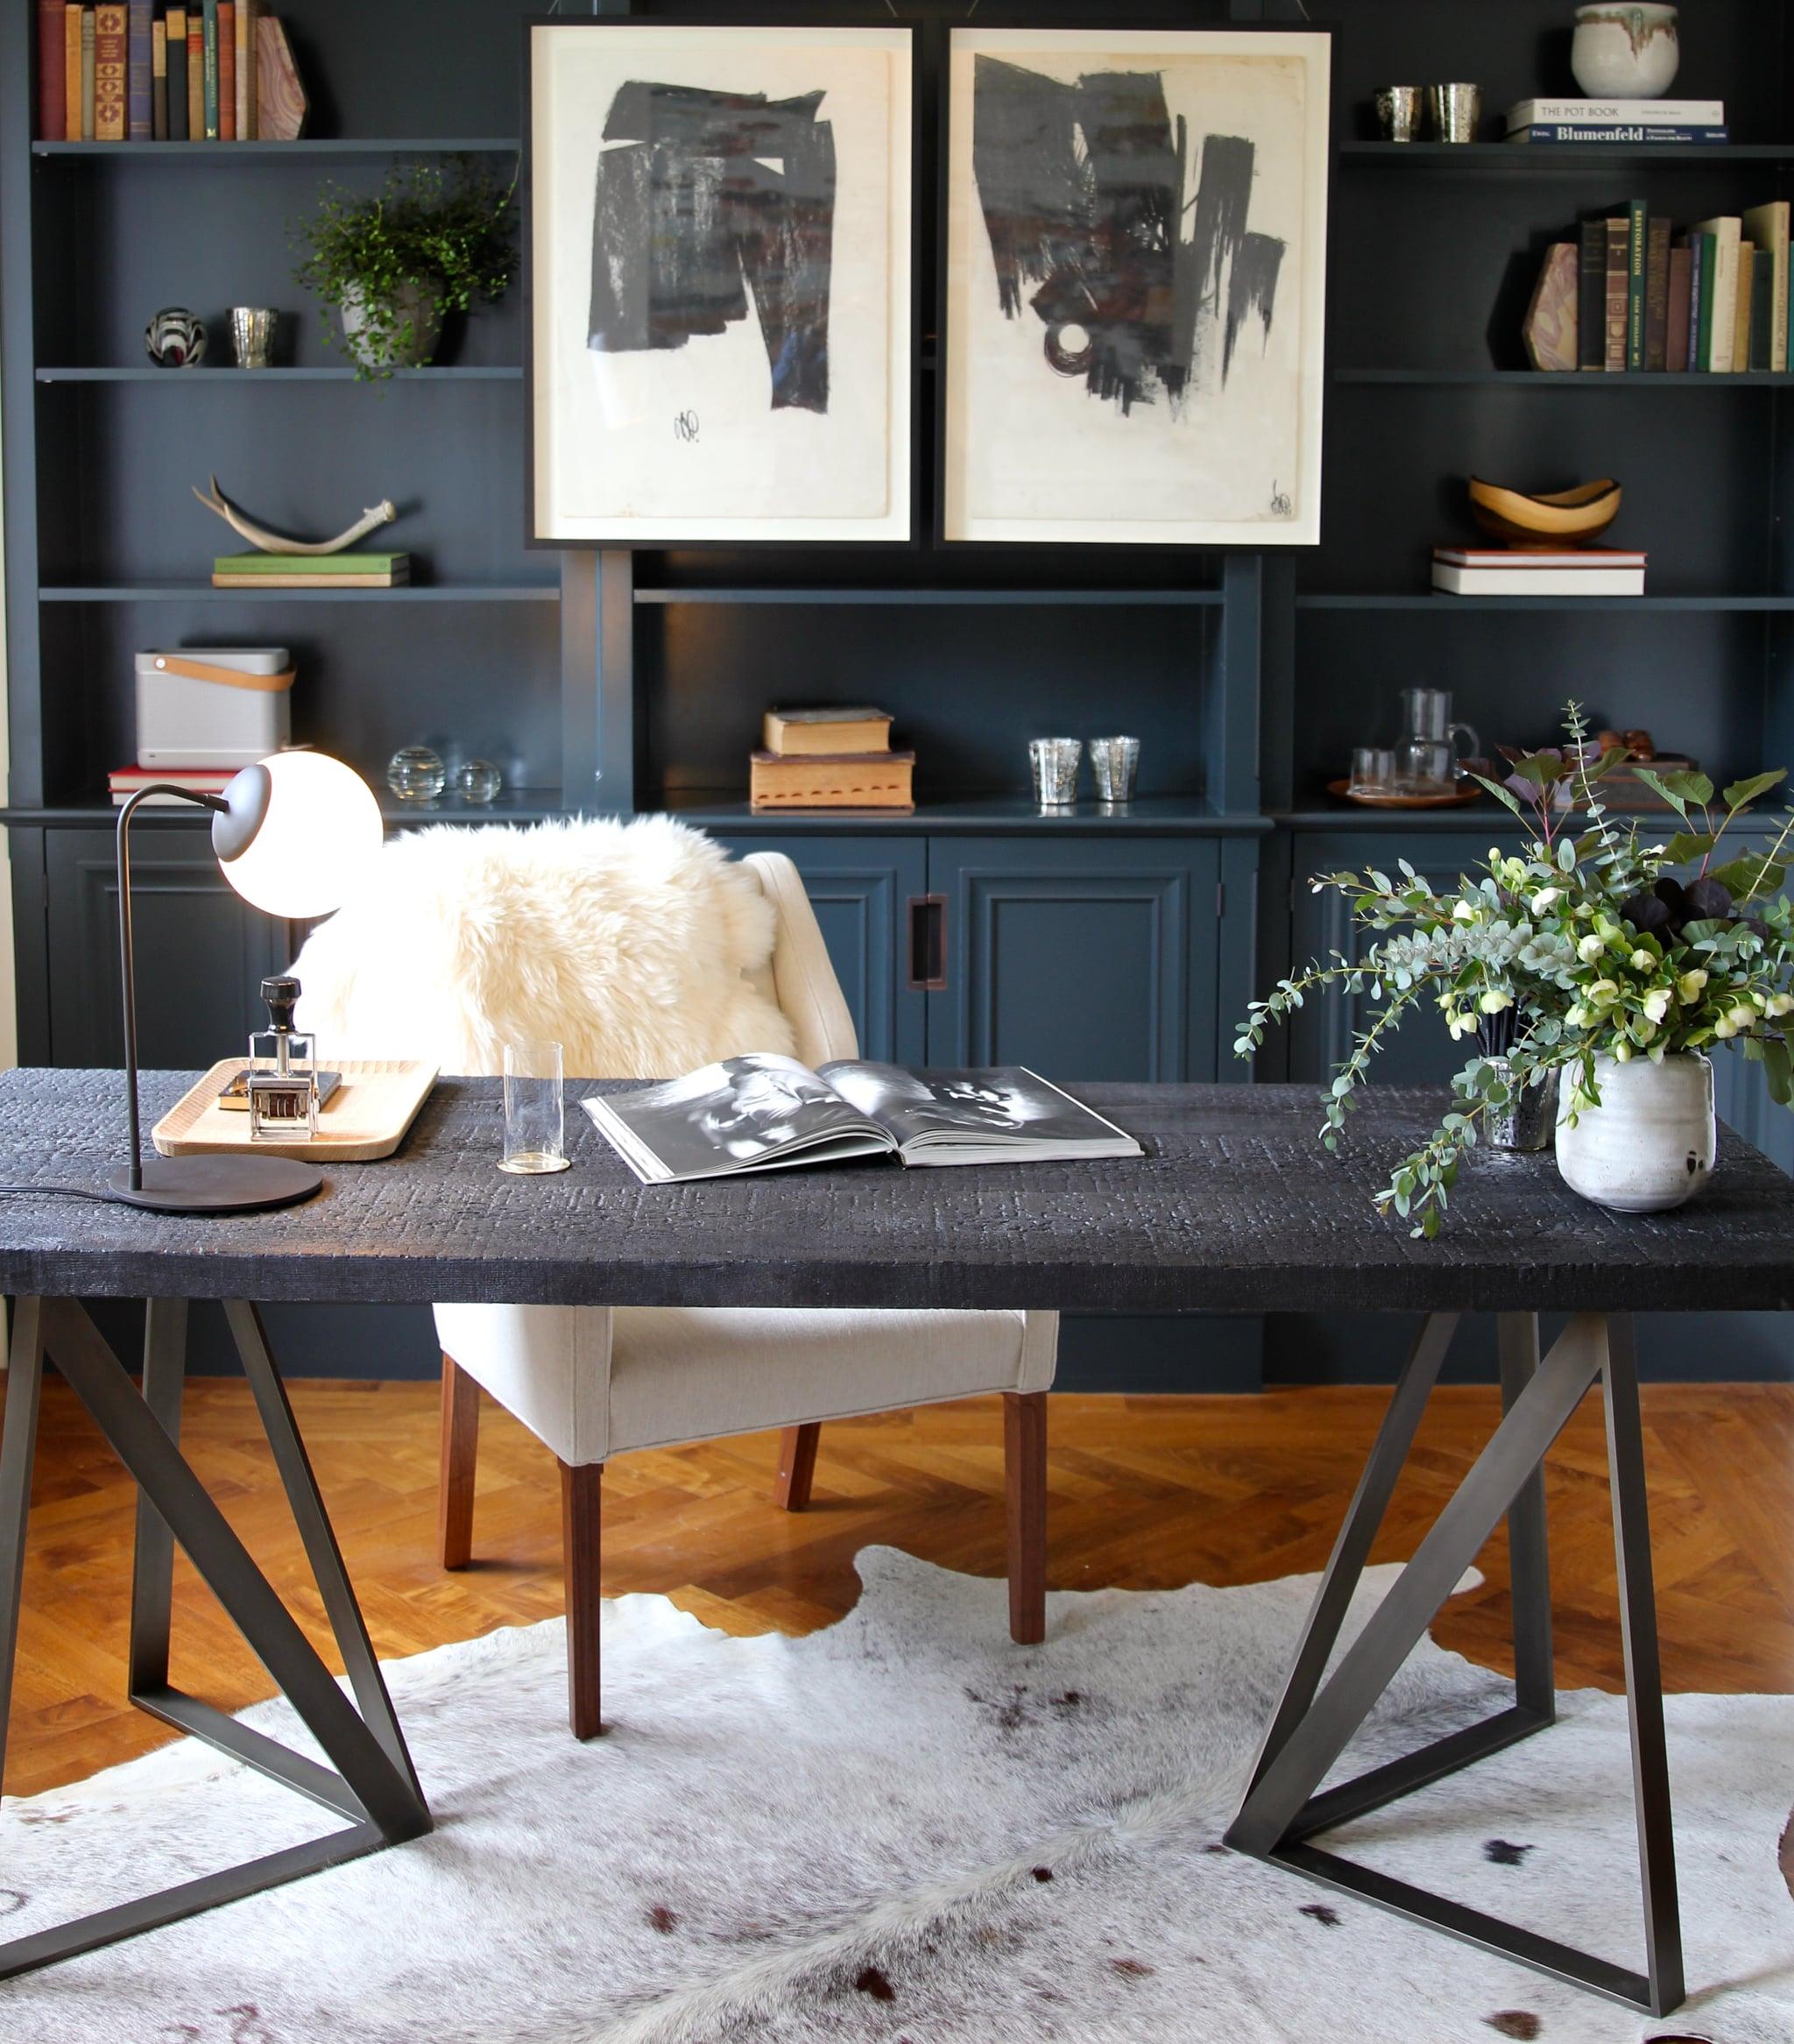 How To Make Your Home Cozy For Fall Cheaply Popsugar Home